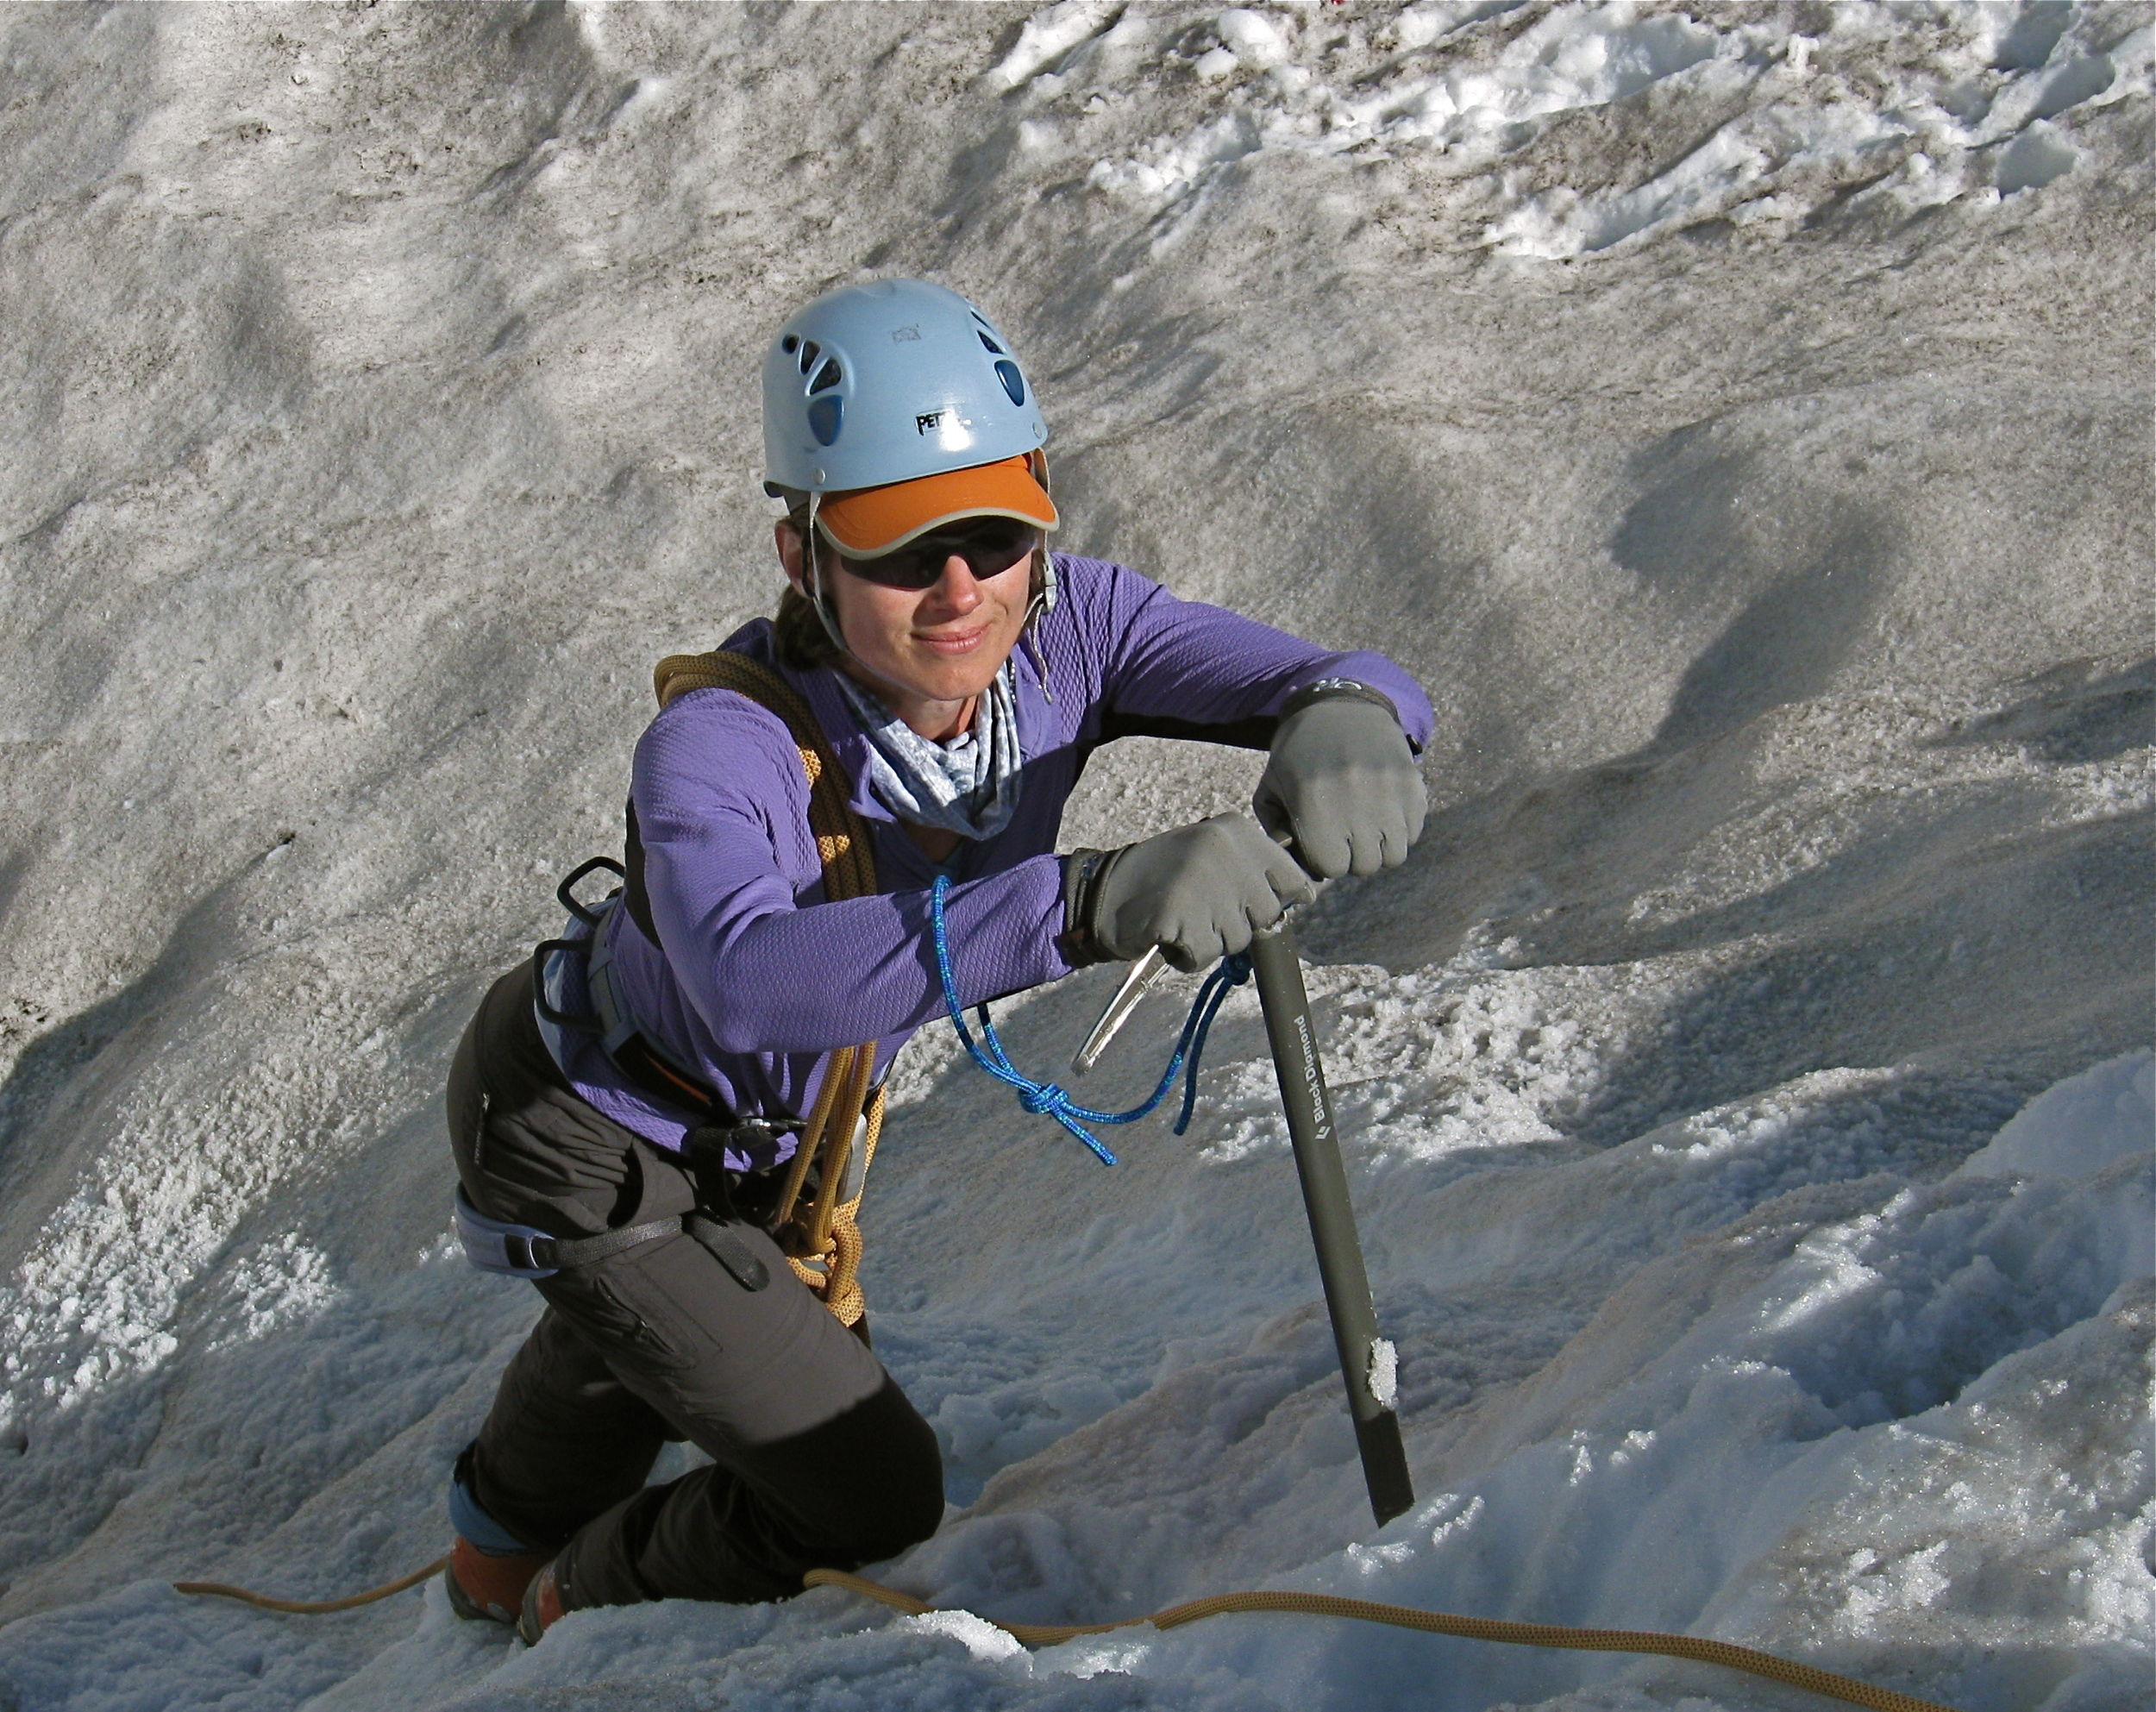 Training on Mt Rainier